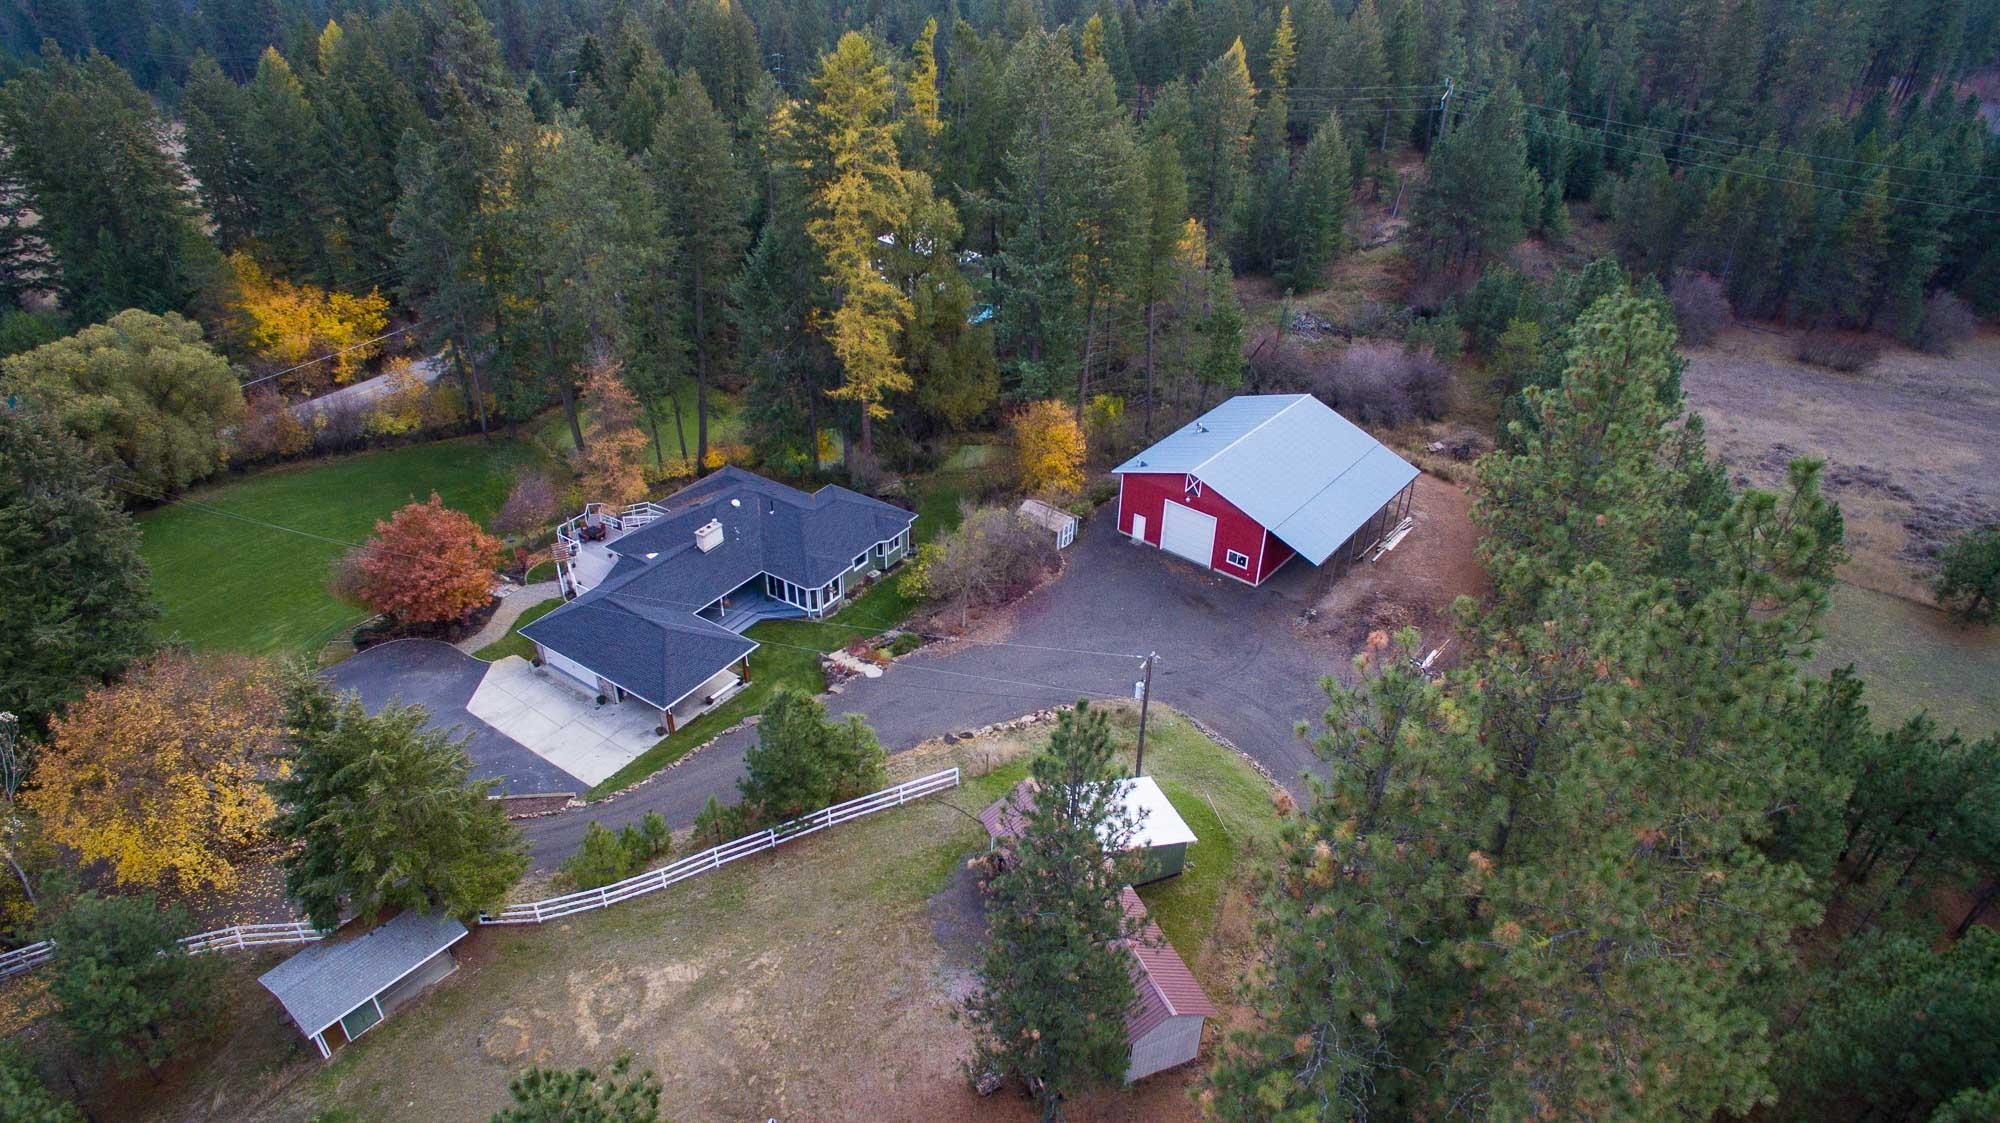 RL Miller Photography  Spokane Aerial PhotographyRL Miller Photography